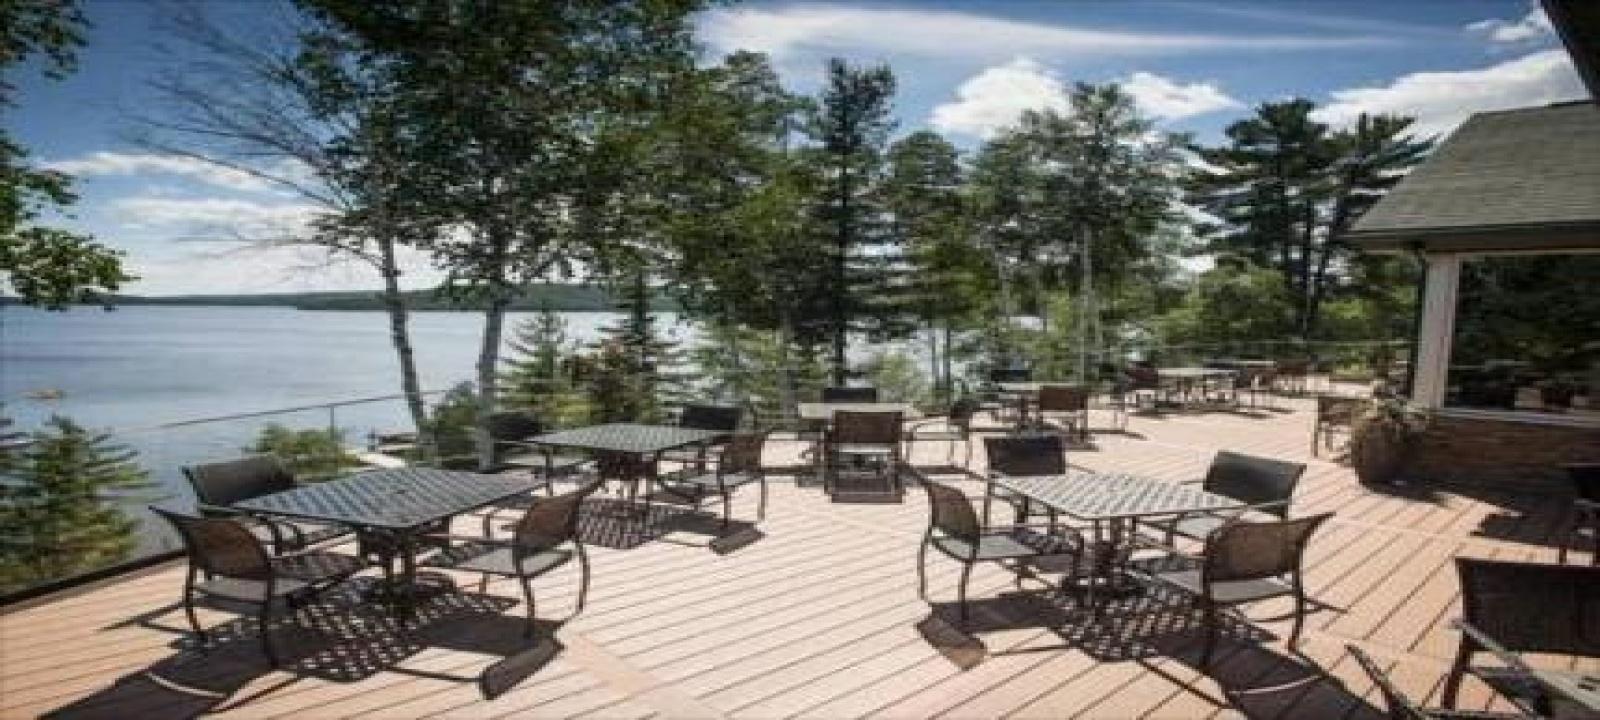 Duhamel-Ouest, Canada, ,International Properties,For Sale,1069